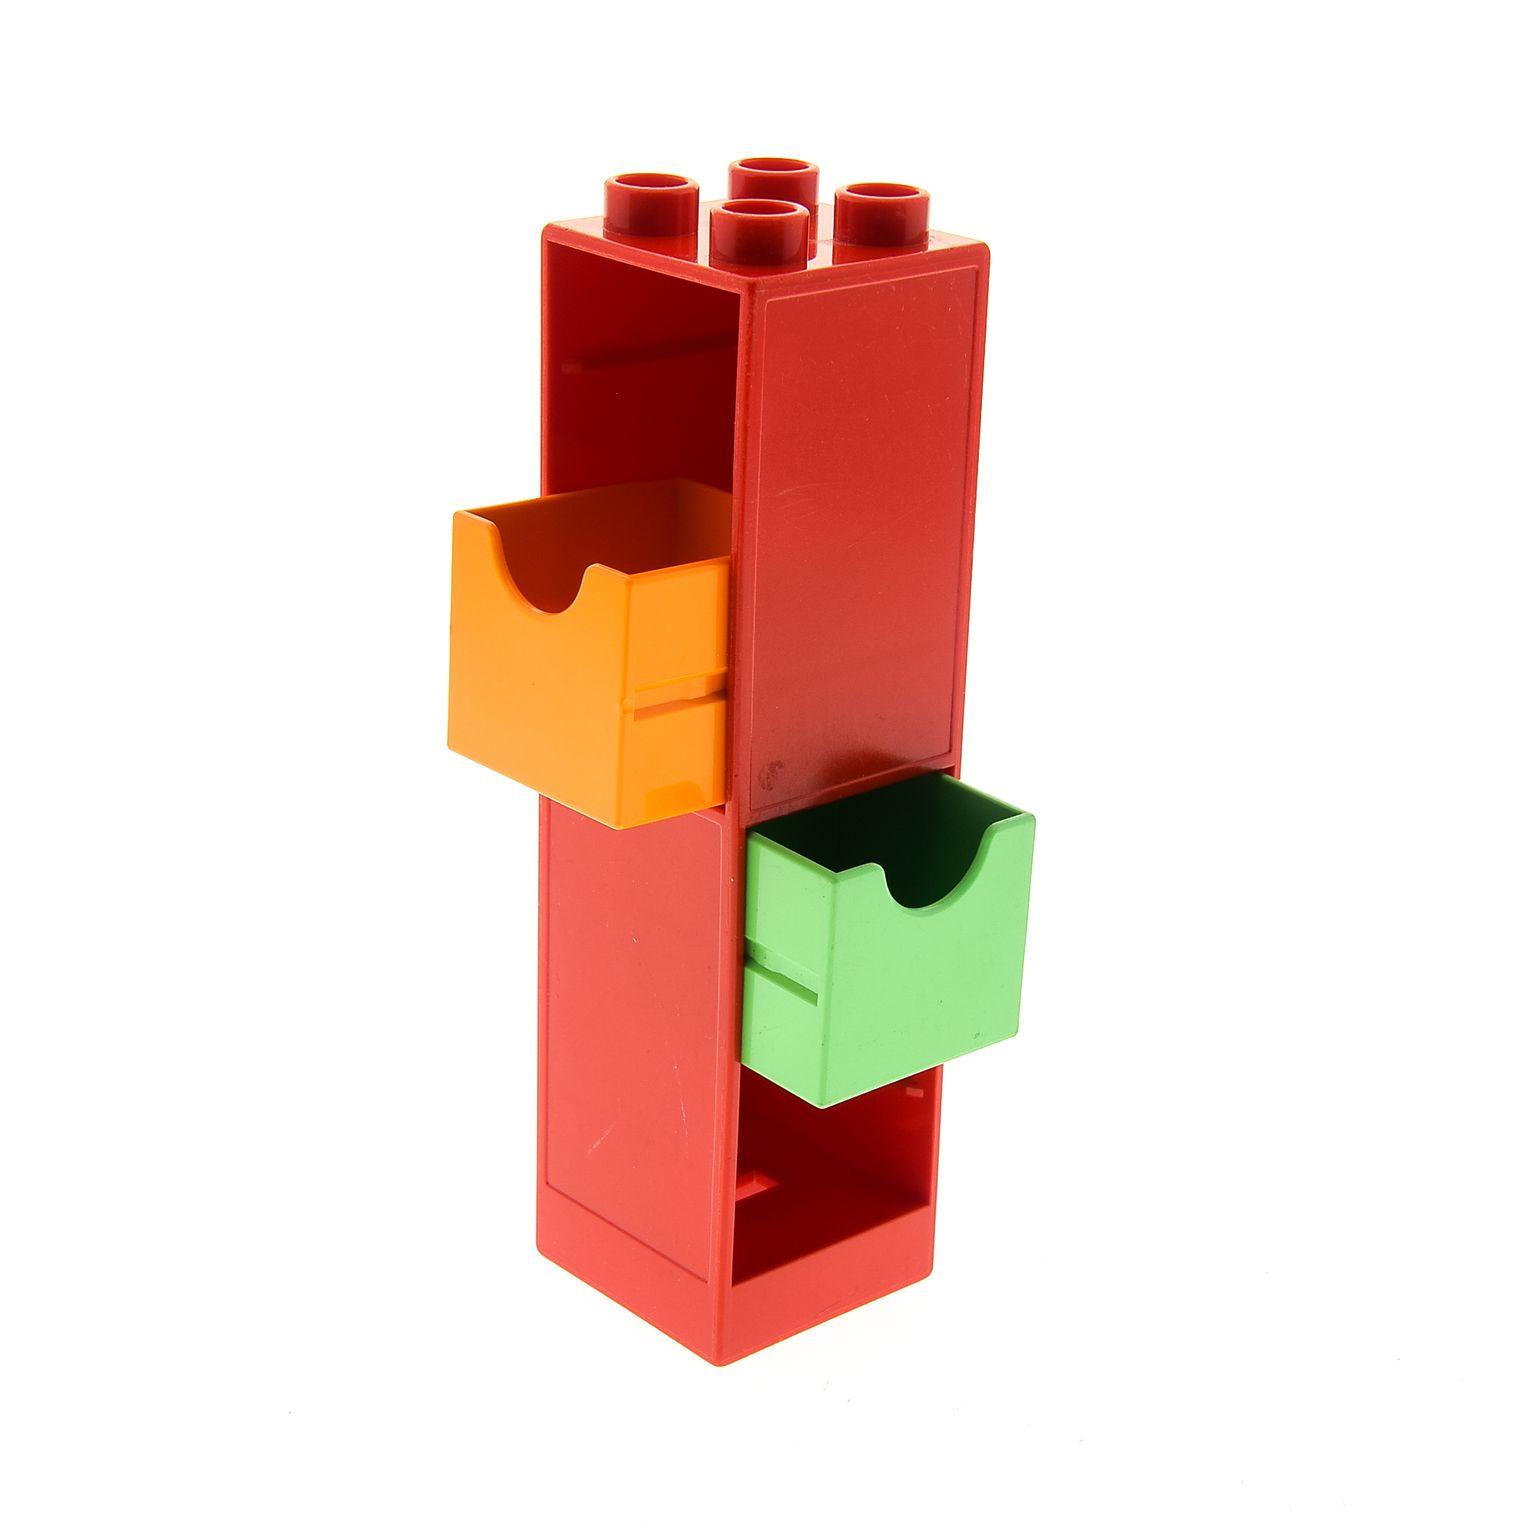 1 x lego duplo m bel regal rot 2x2x6 schrank s ule mit 2x. Black Bedroom Furniture Sets. Home Design Ideas